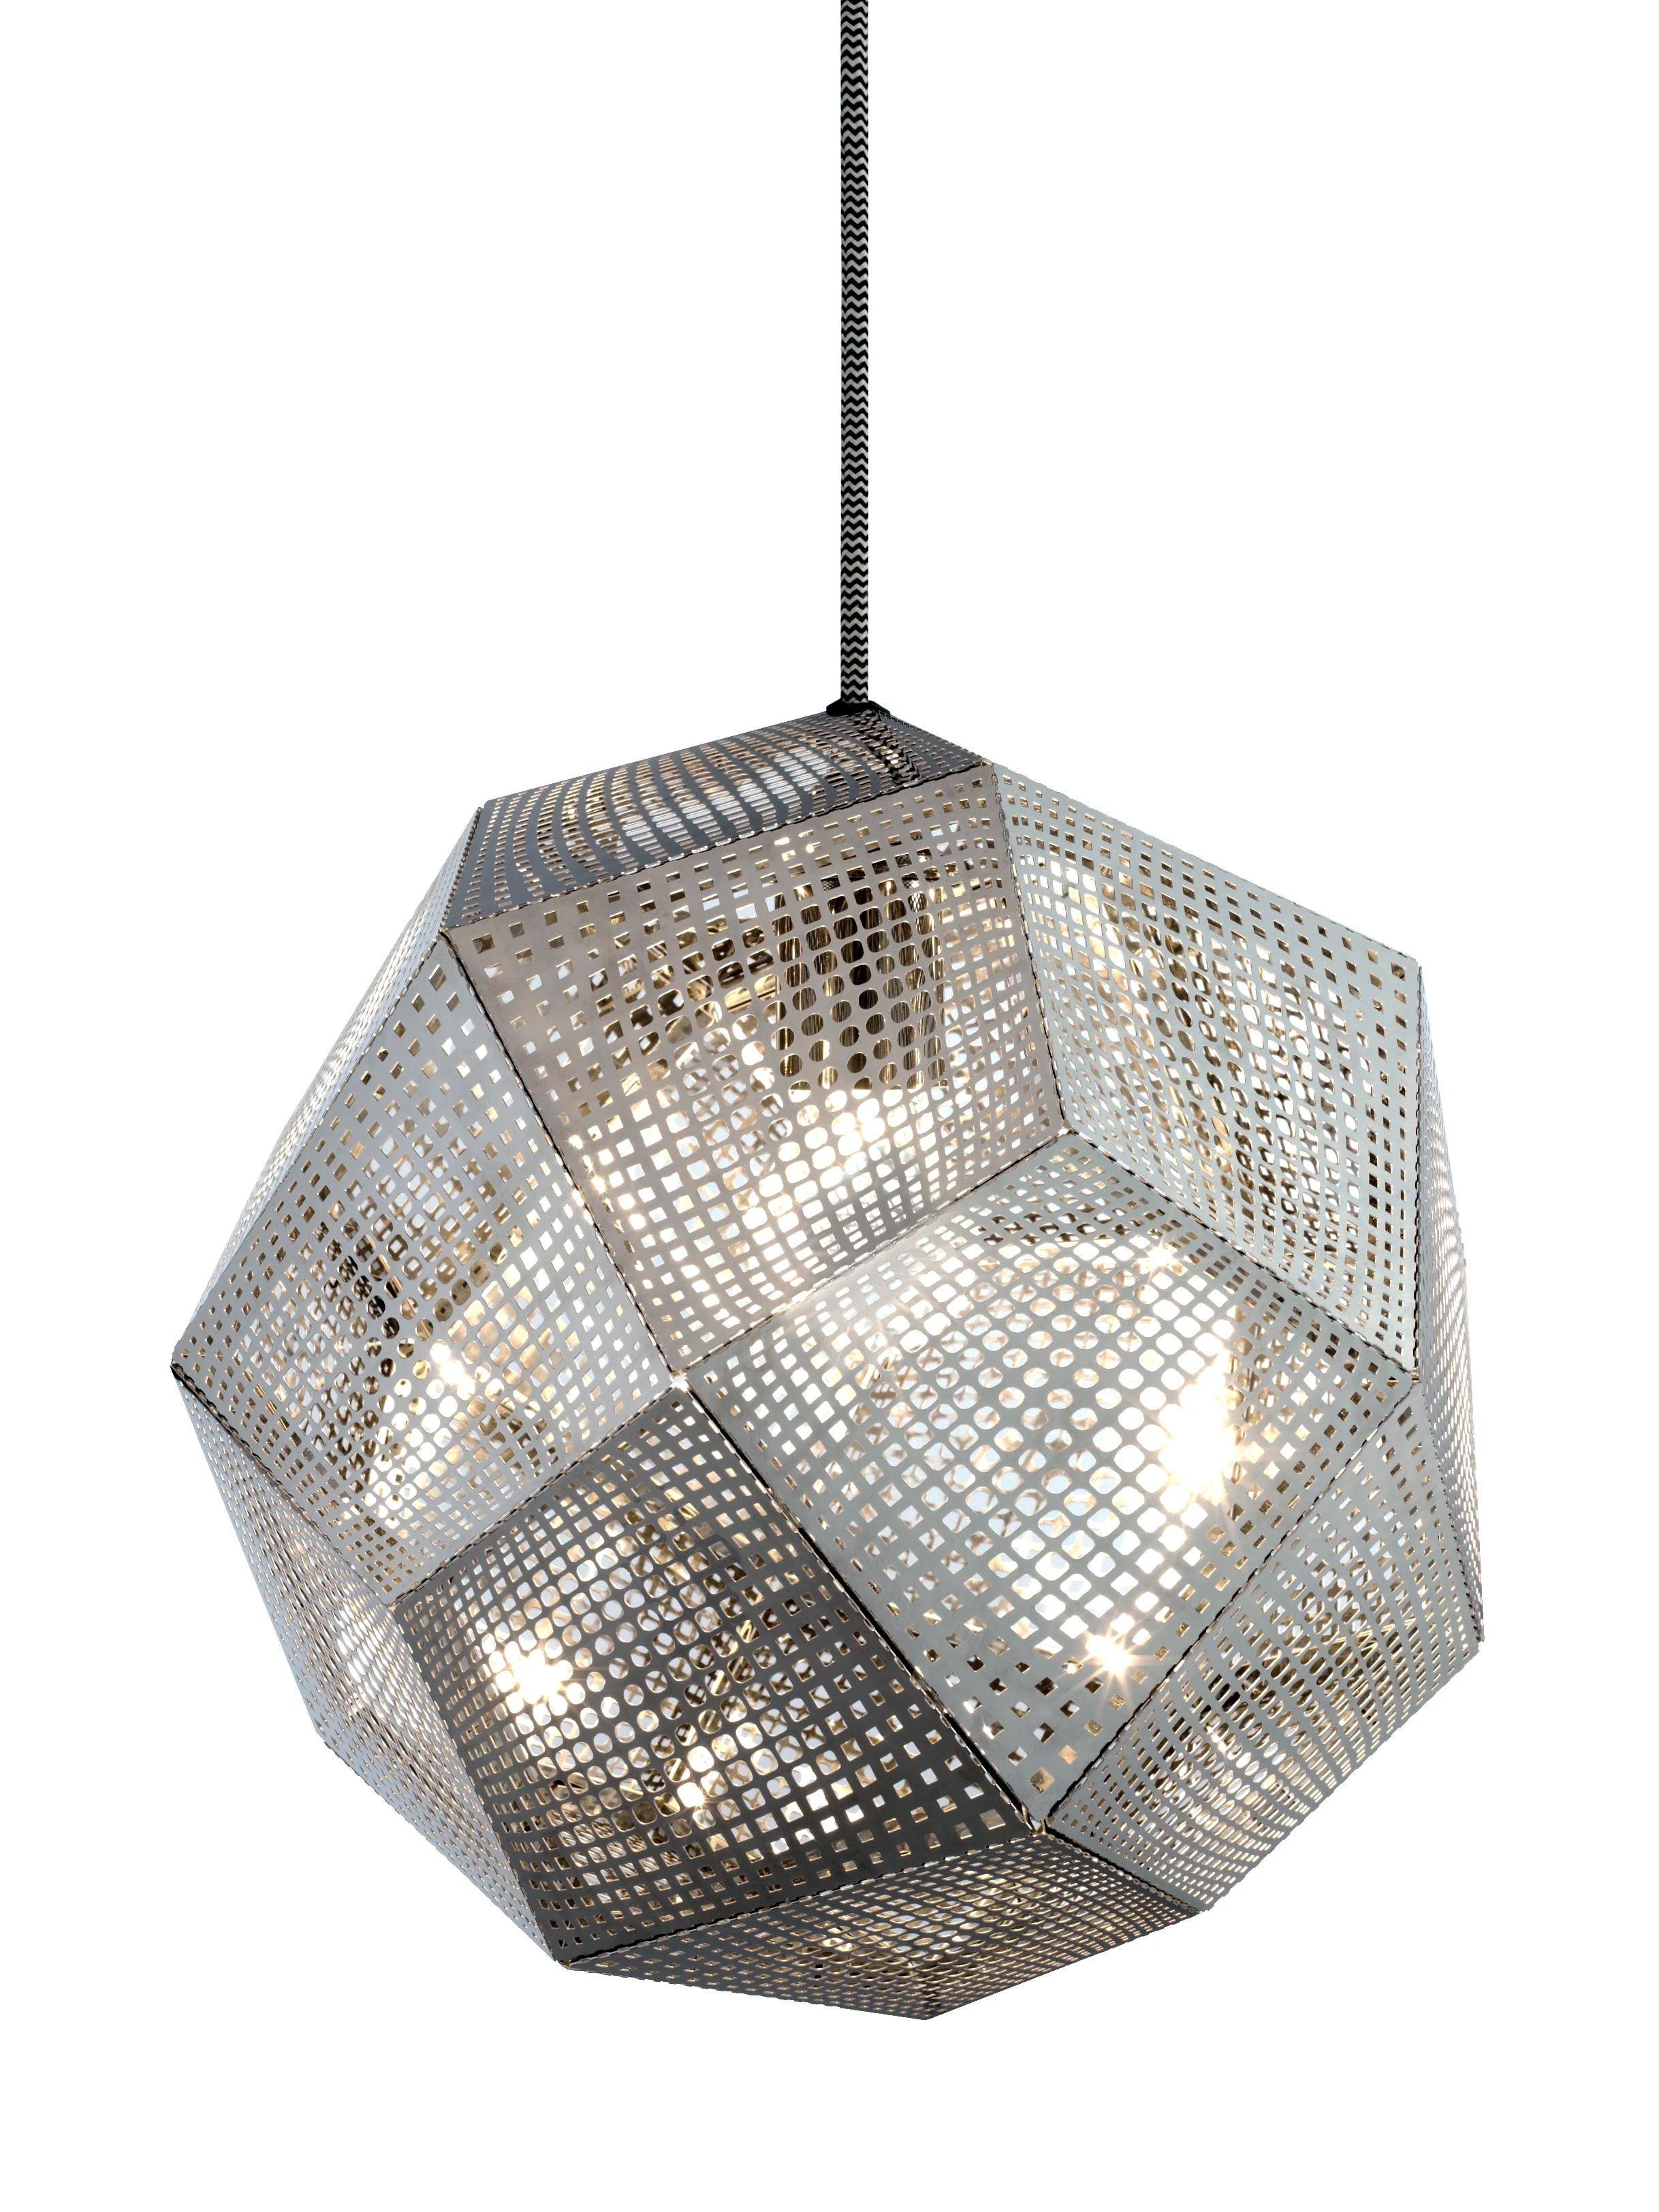 Lukloy Modern Ball Pendant Lamp Steel Ceiling Pendant Light Hang Light Cord Hang Lamp For Living Room Dining Table Island Pendant Lights Aliexpress